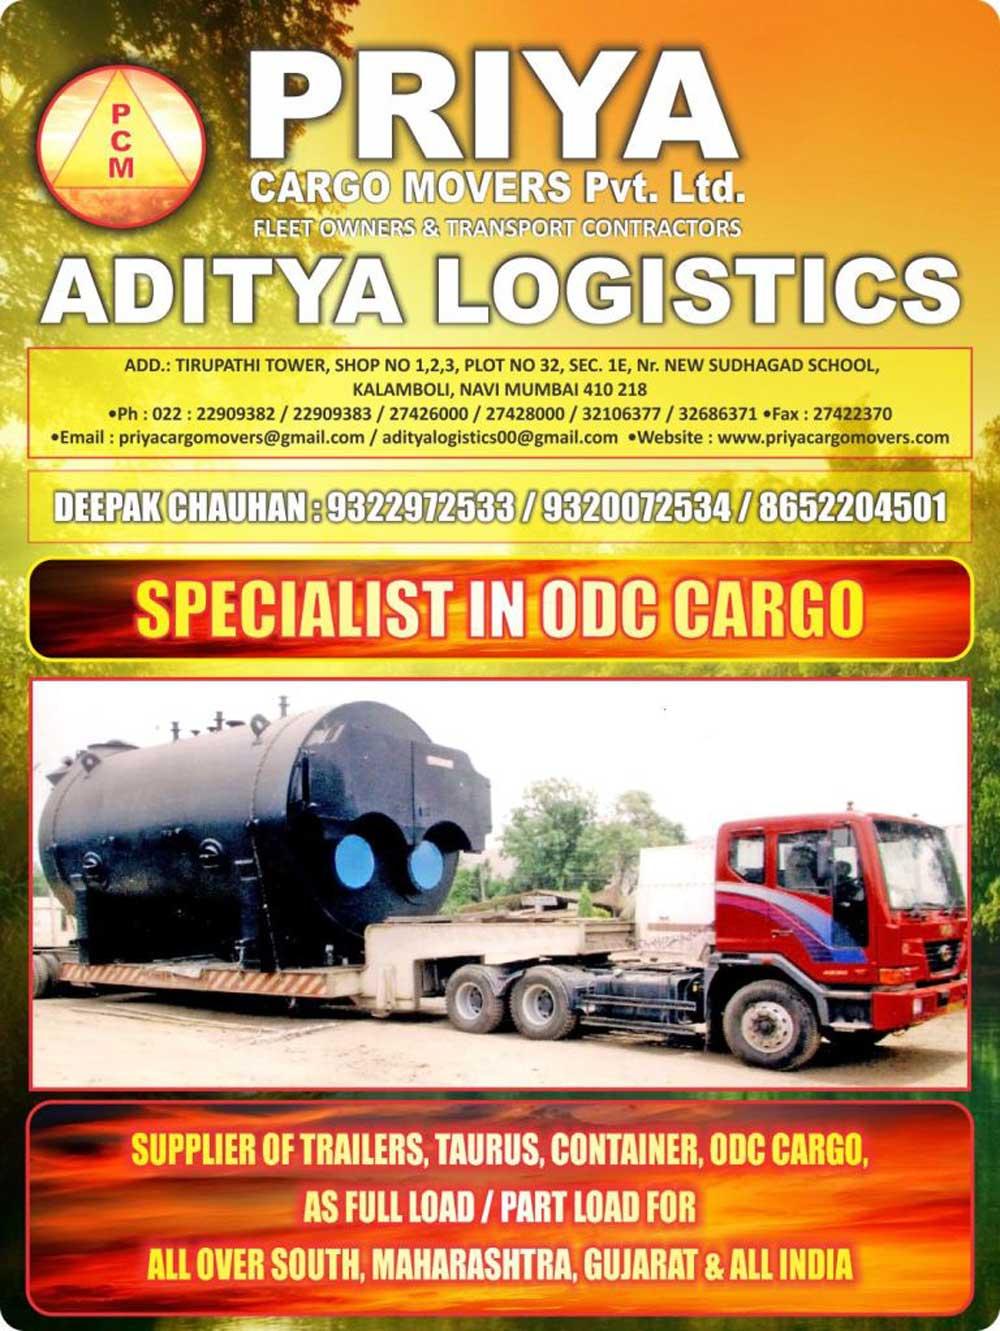 Priya Cargo Movers